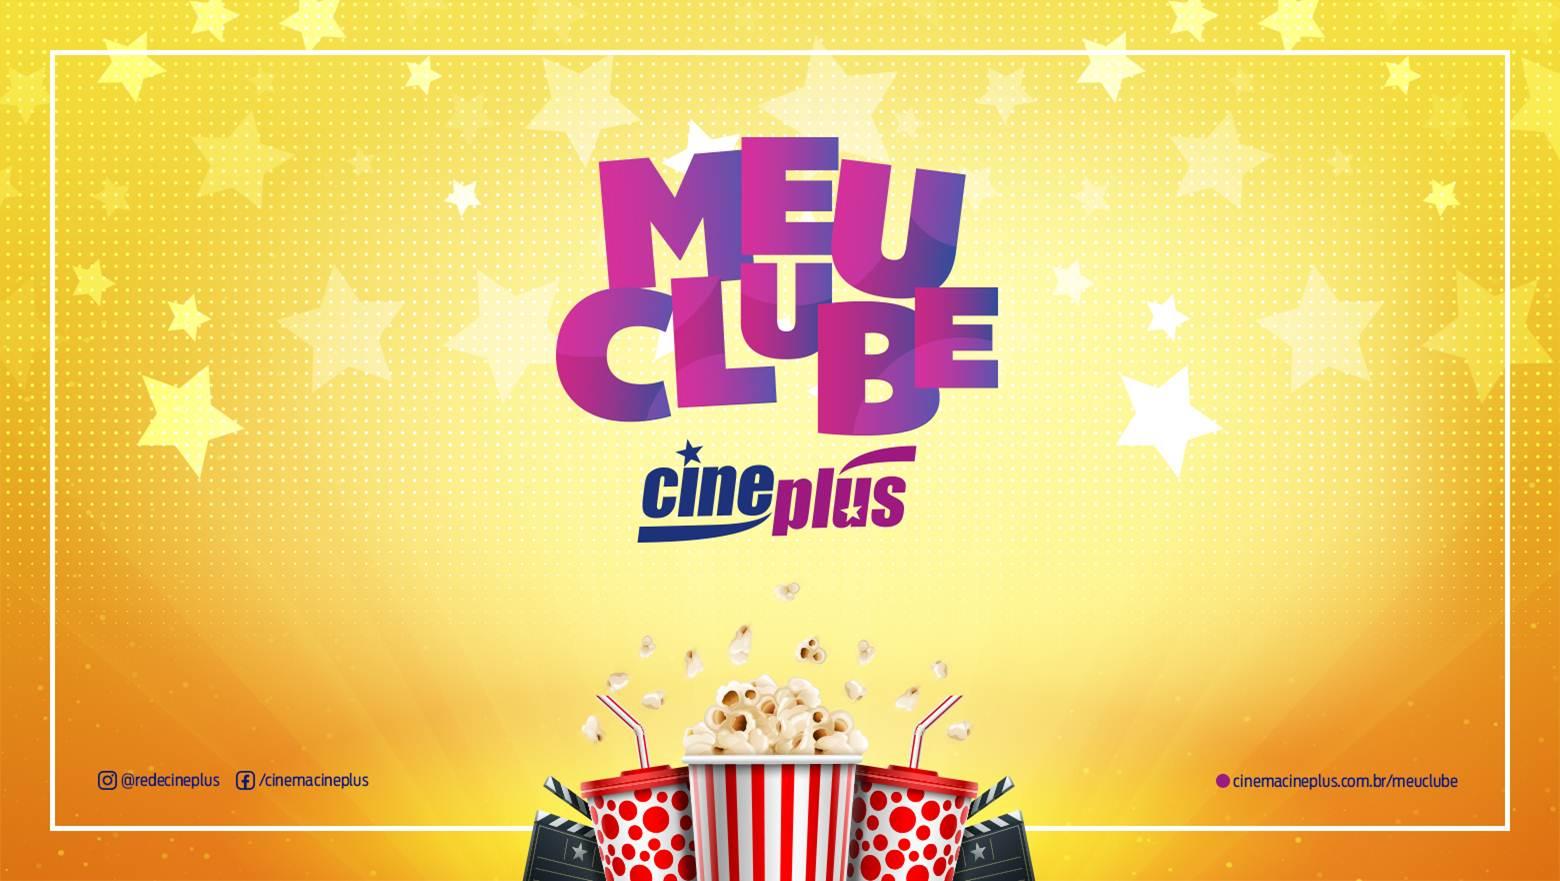 Meu Clube Cineplus programa de fidelidade que concede benefícios e descontos aos clientes